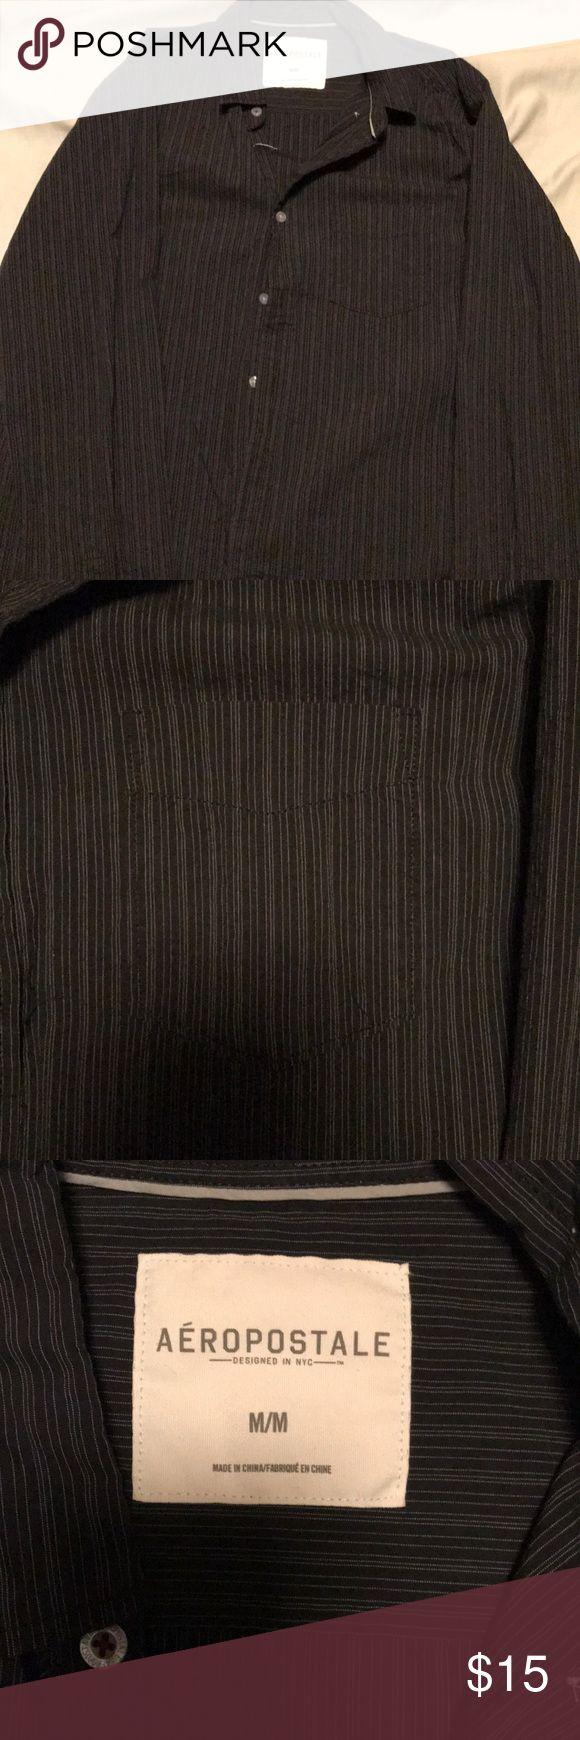 Aeropostale button down shirt Aeropostale button down shirt. Never worn but missing top button. Aeropostale Shirts Casual Button Down Shirts